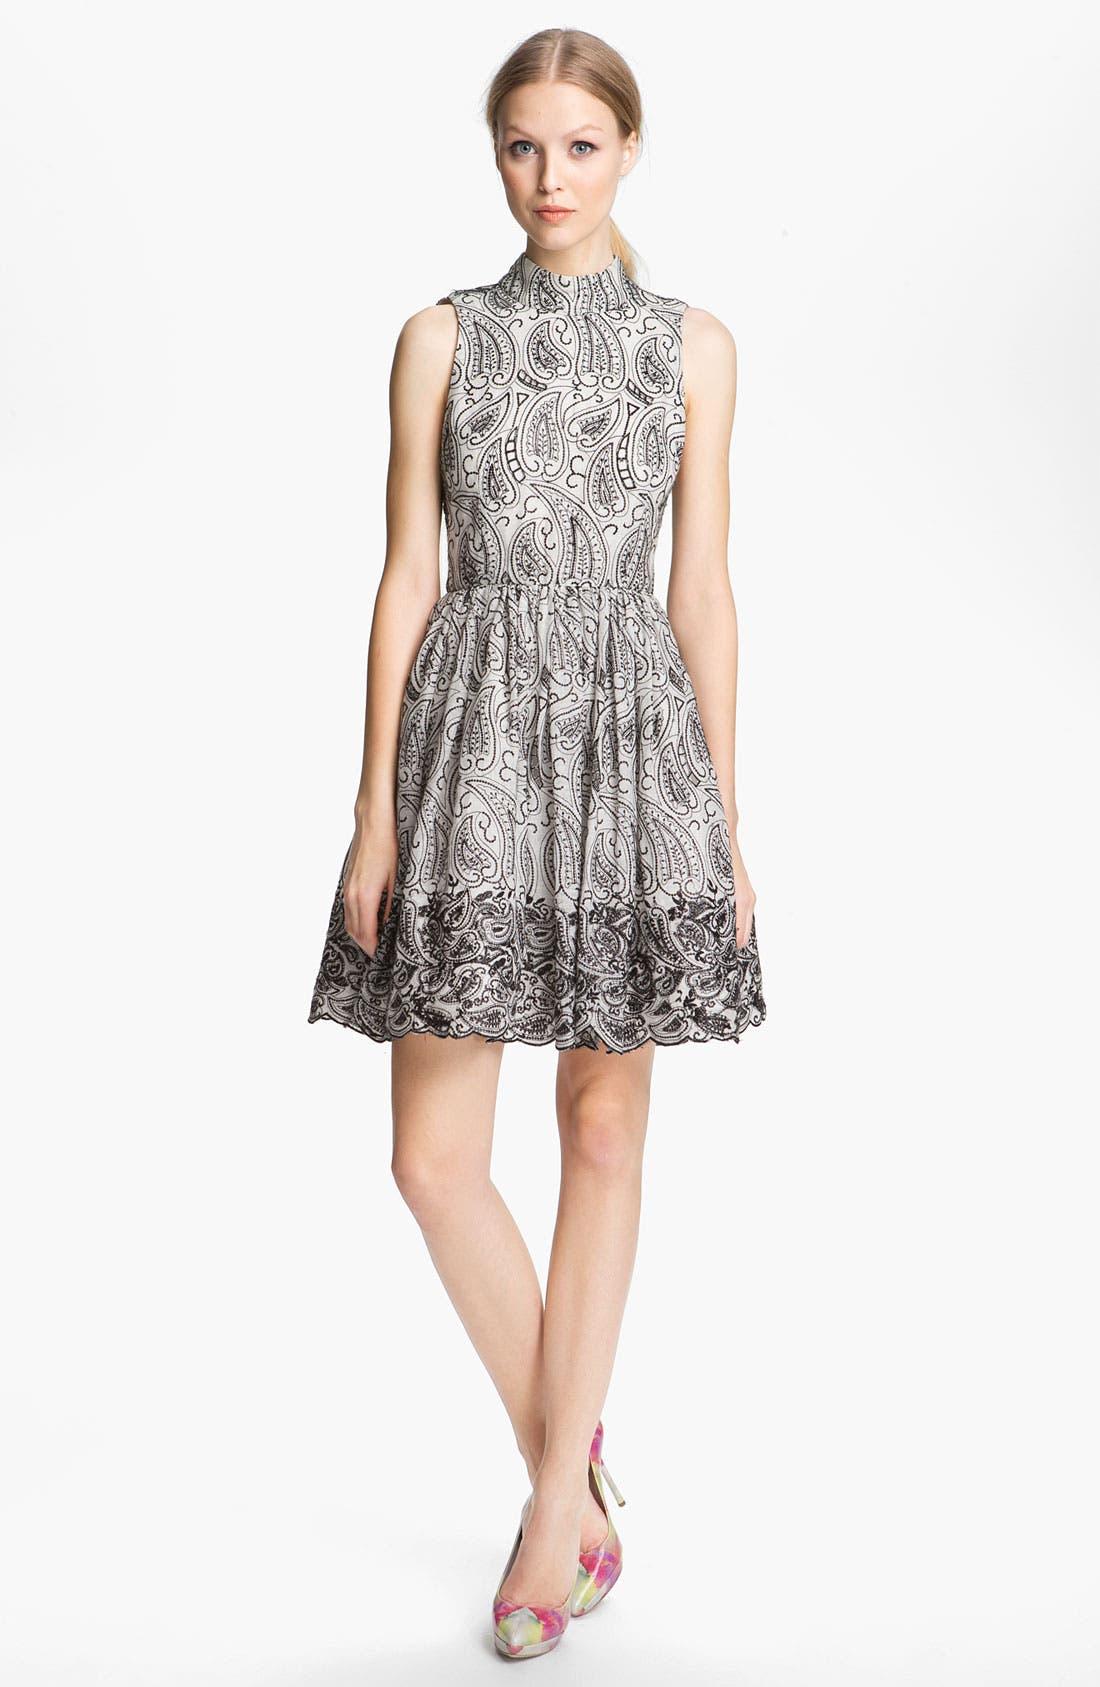 Main Image - Alice + Olivia Paisley Print Flared Dress